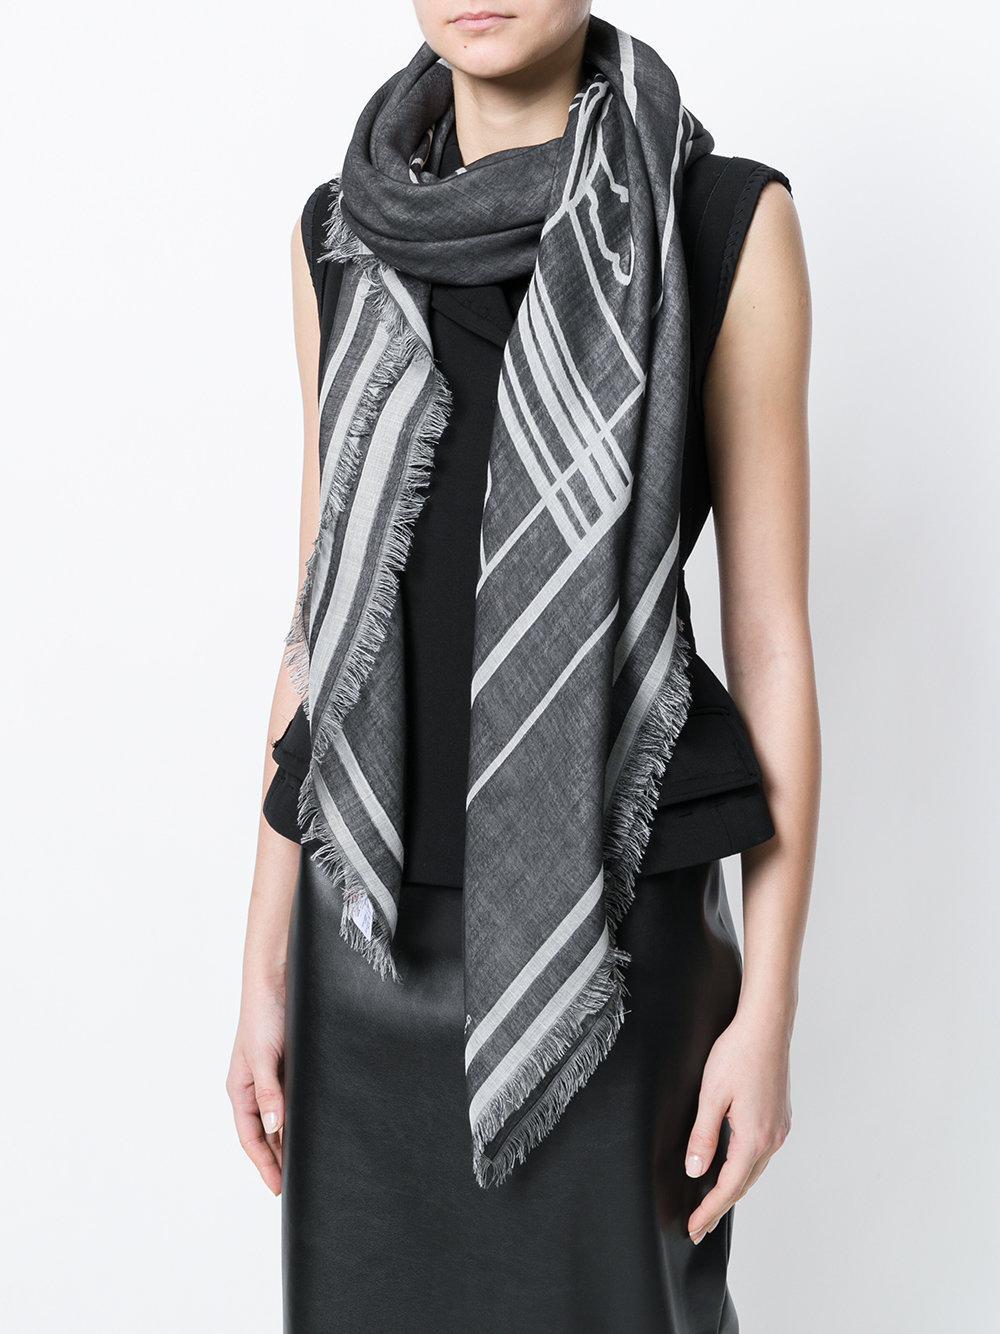 frayed star print scarf - Grey Givenchy dl4jfCaO